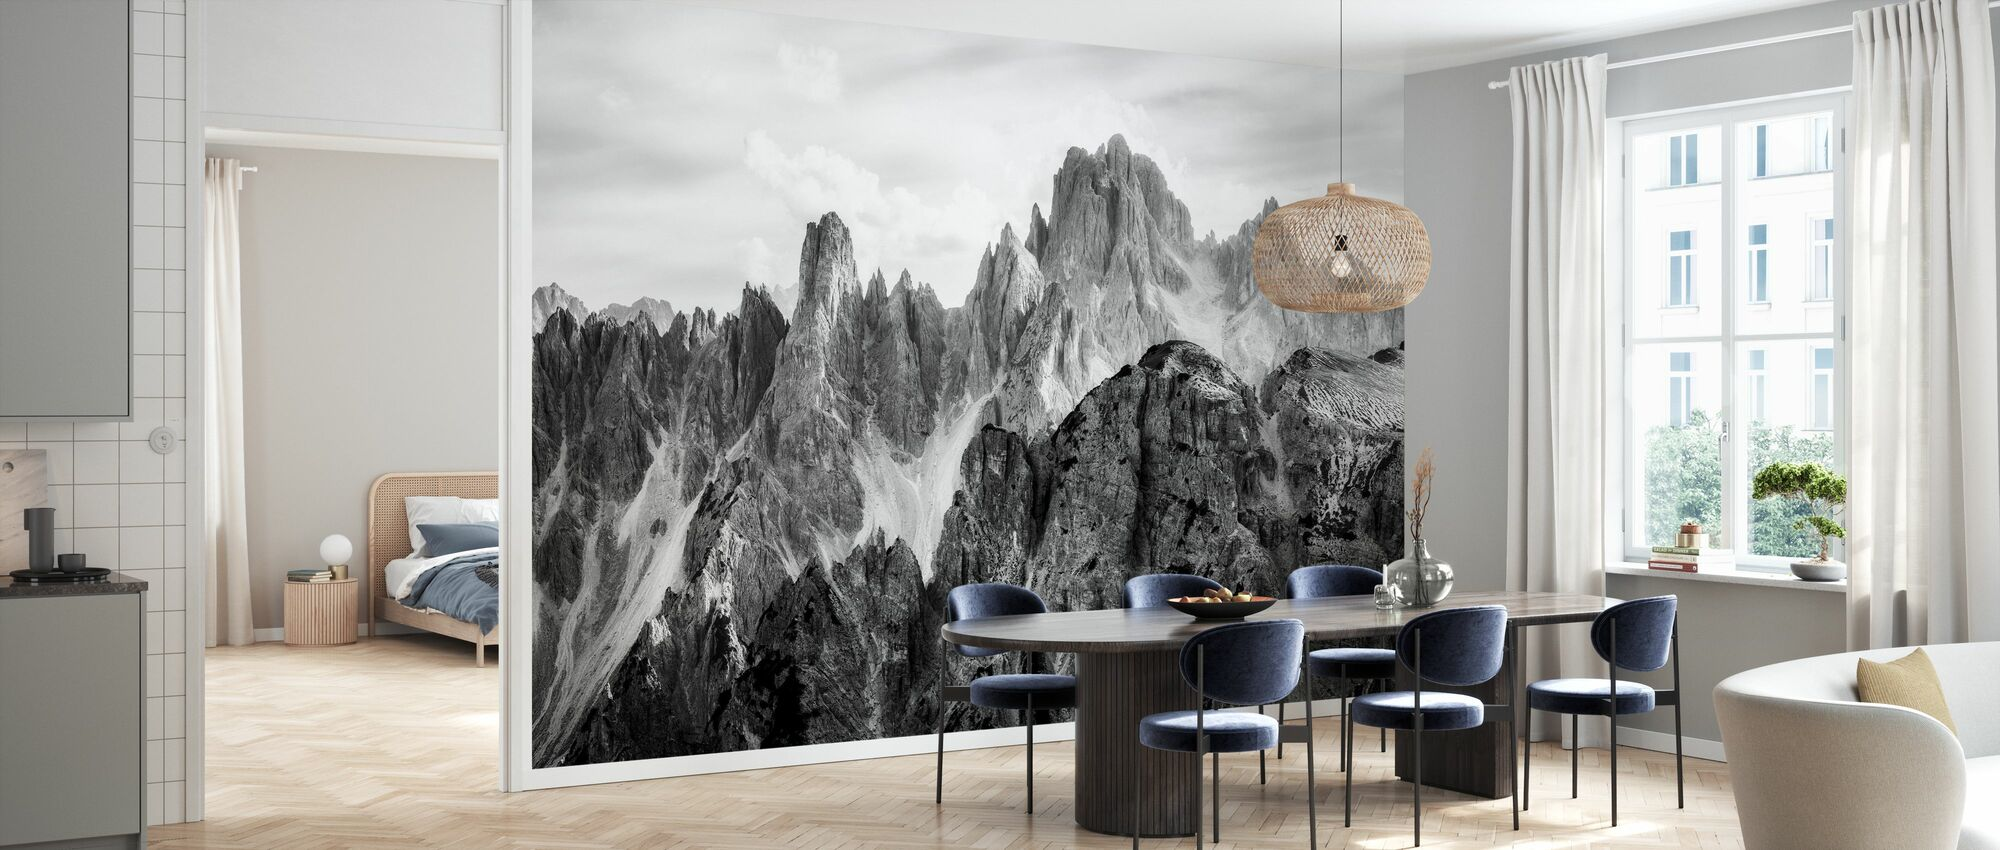 Peaks - Wallpaper - Kitchen